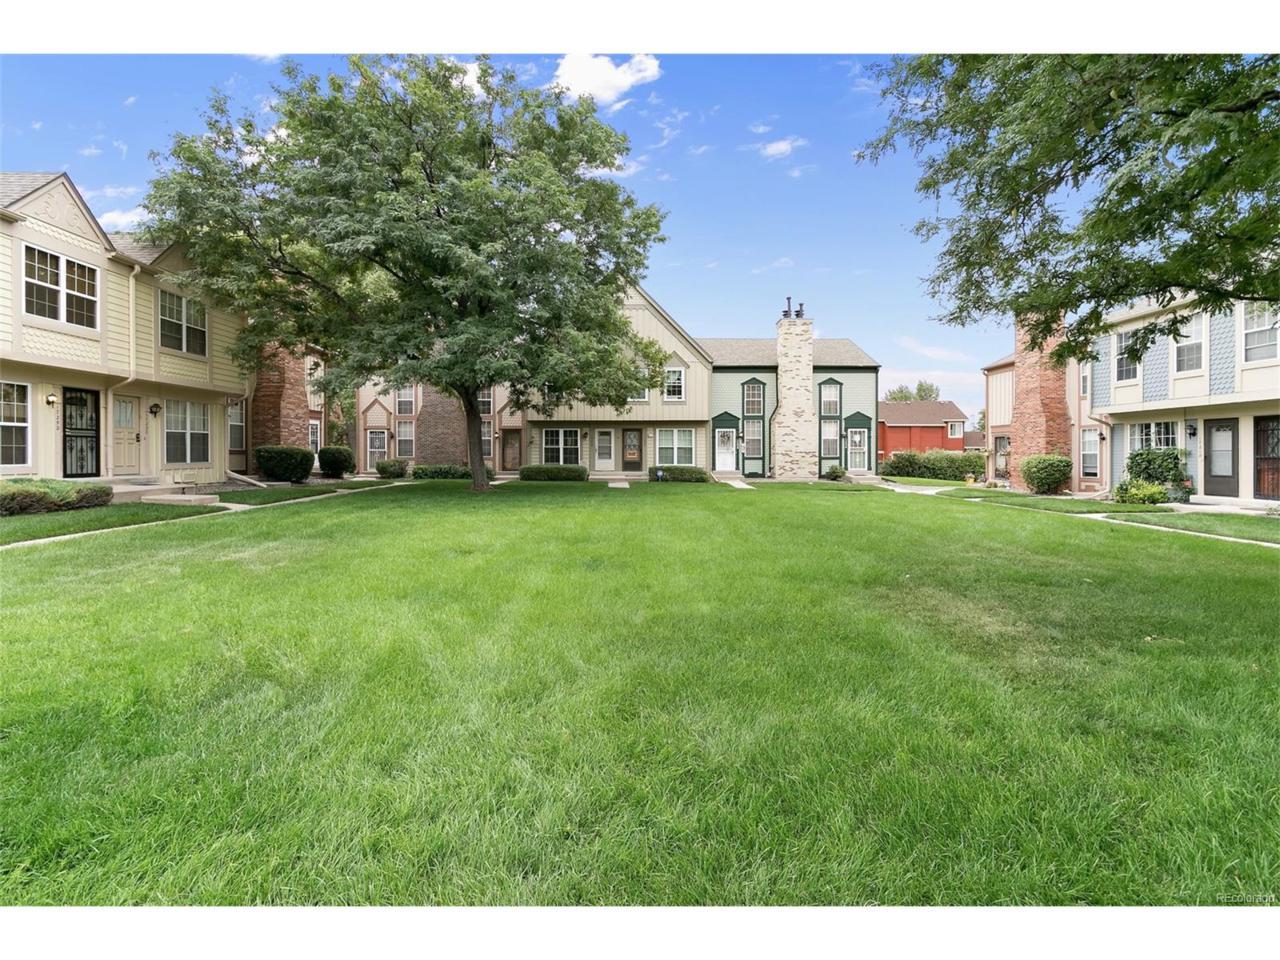 1723 S Blackhawk Way B, Aurora, CO 80012 (MLS #4783626) :: 8z Real Estate